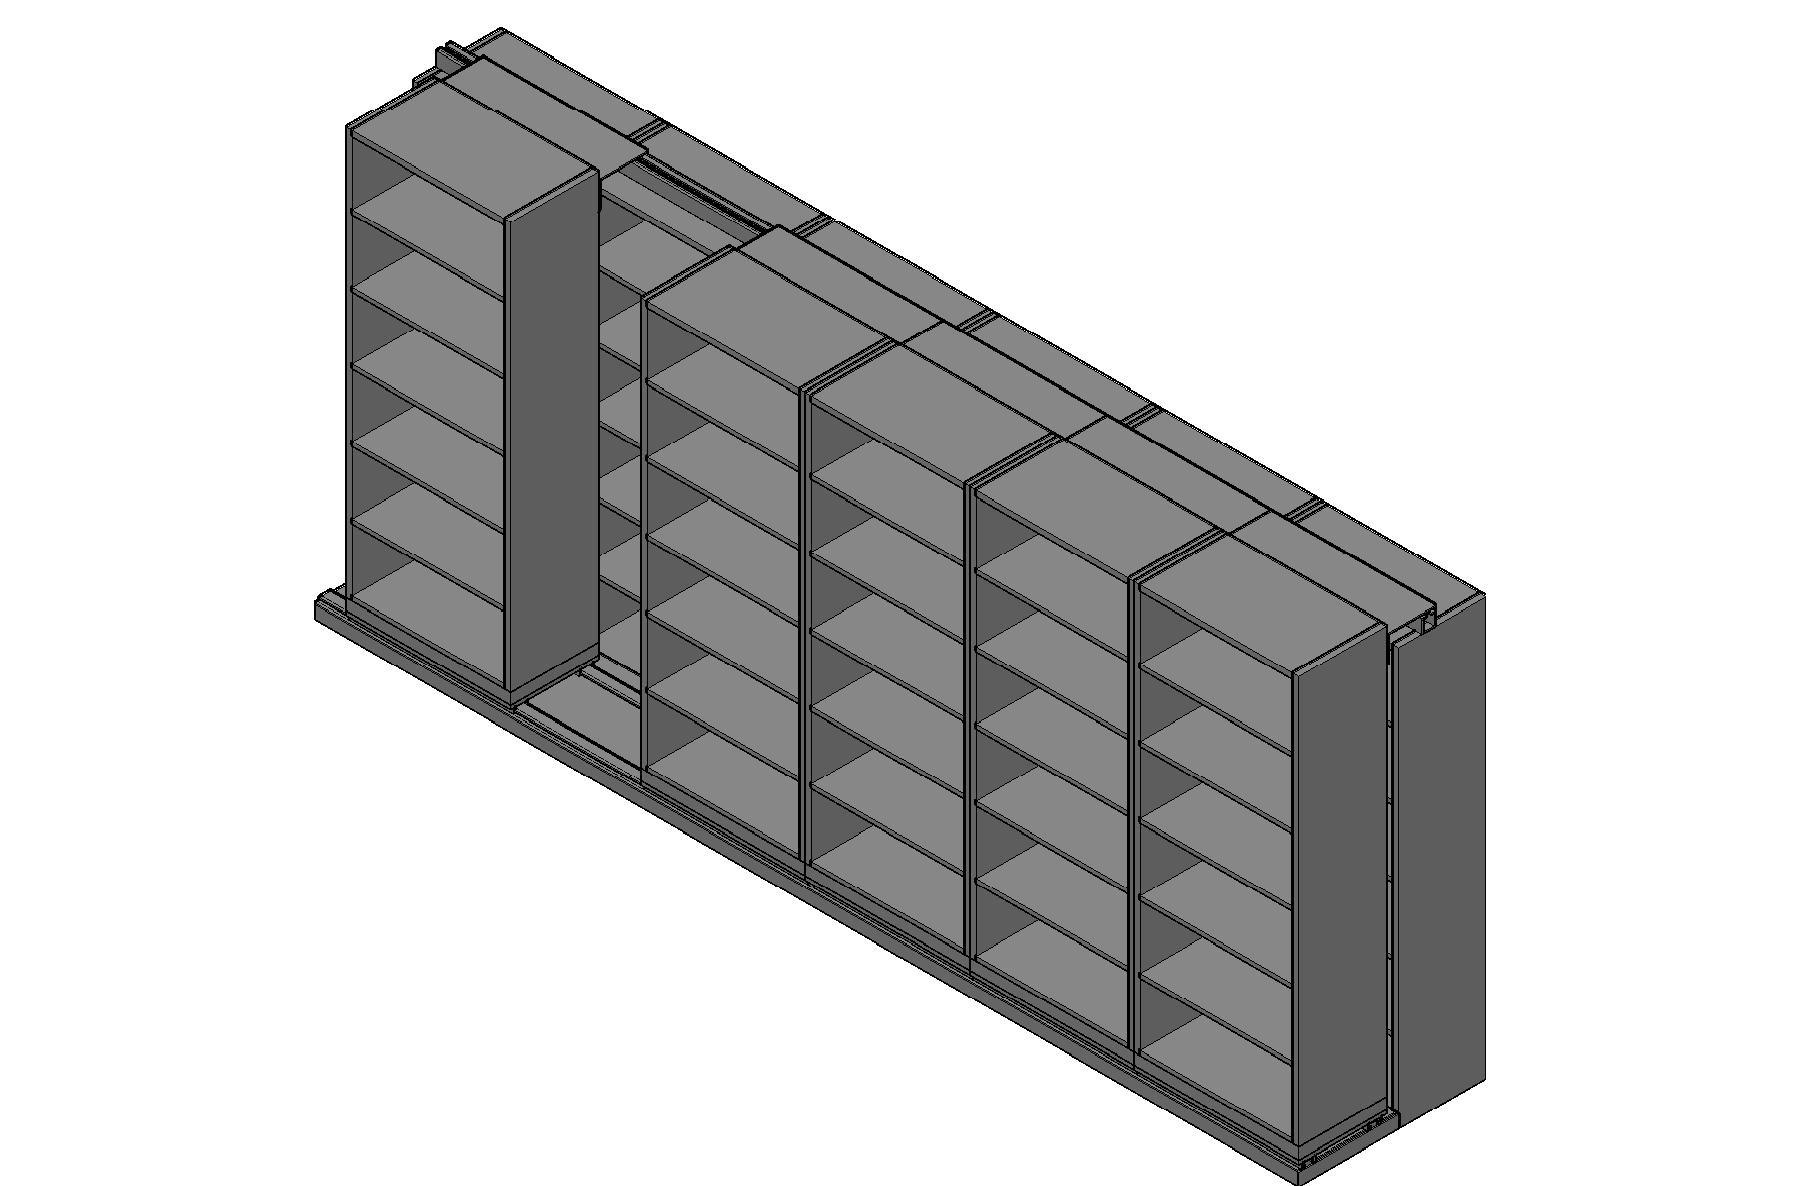 "Box Size Sliding Shelves - 2 Rows Deep - 6 Levels - (30"" x 16"" Shelves) - 184"" Total Width"